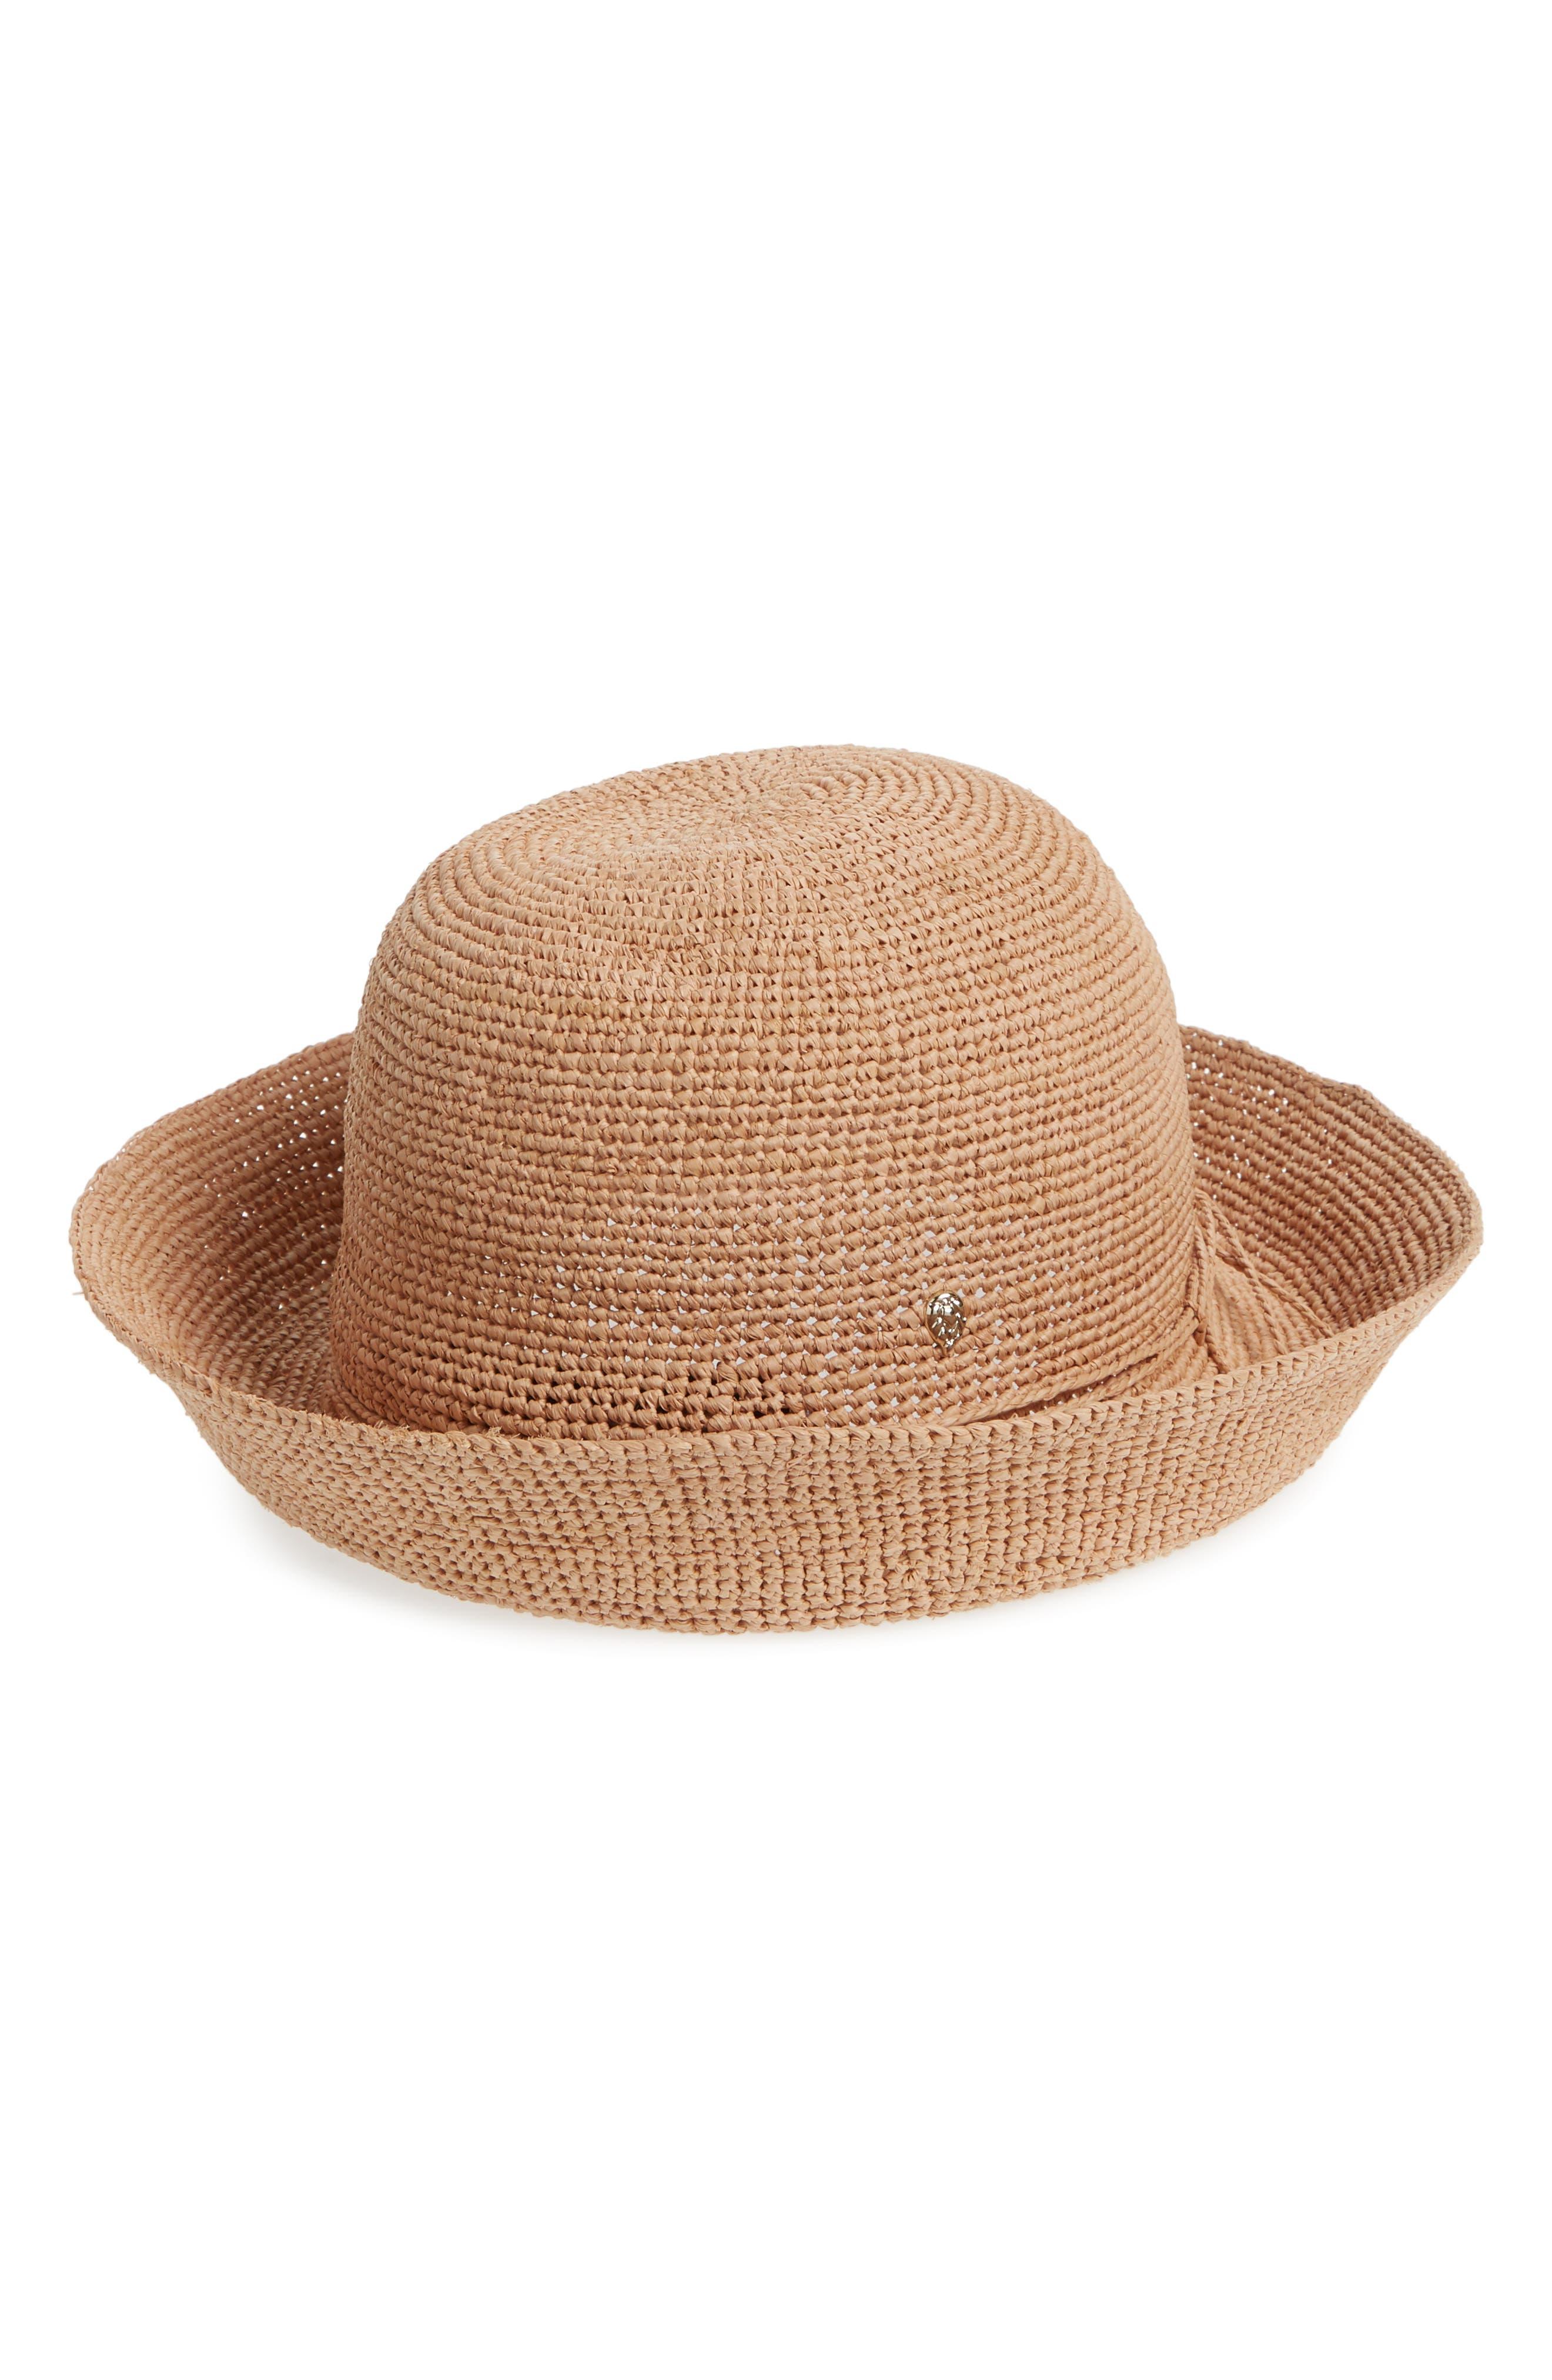 Classic Upturn Crocheted Raffia Hat,                             Main thumbnail 1, color,                             Nougat